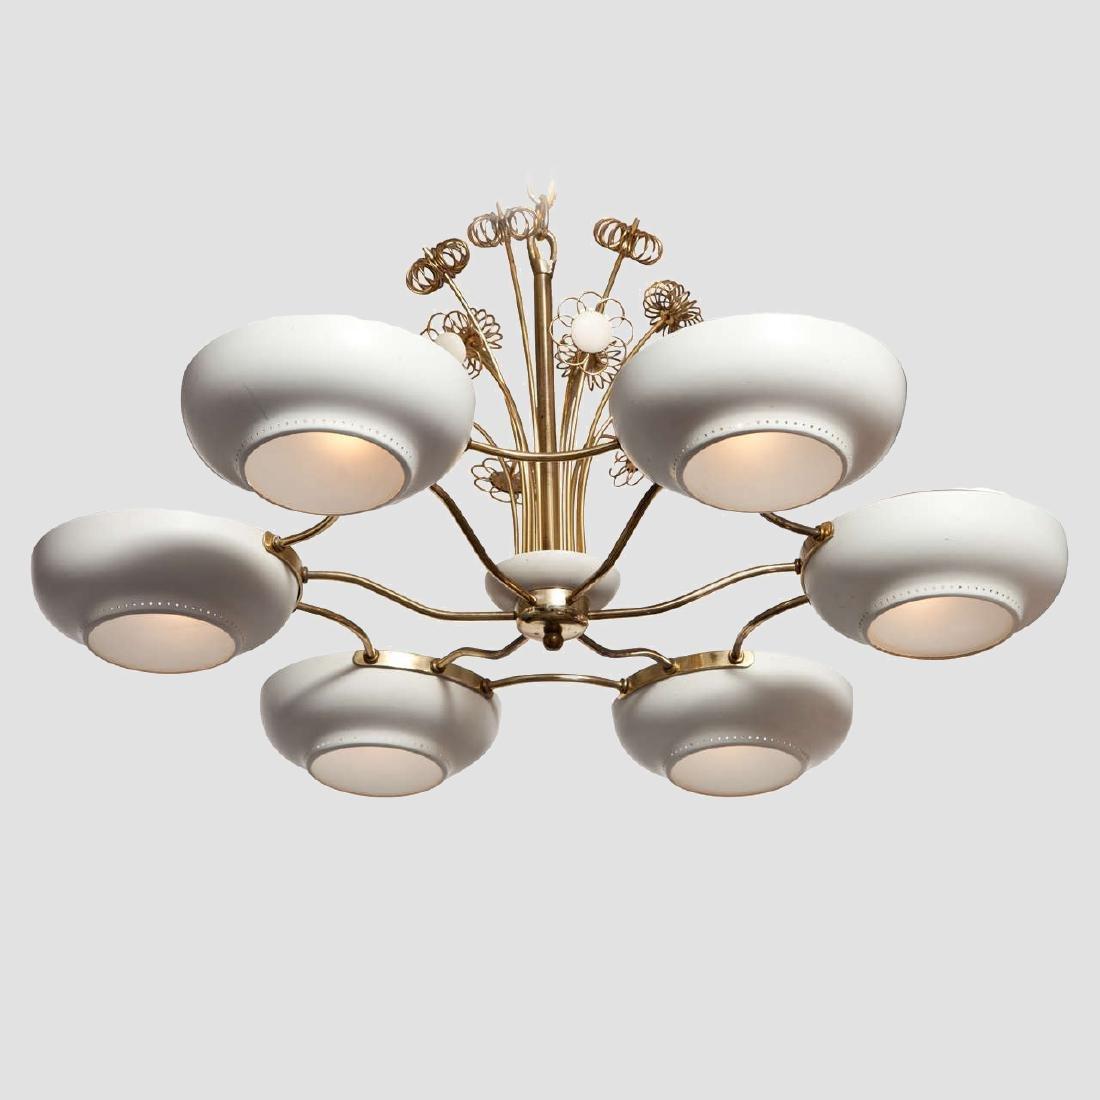 Lightholier Six Lights Brass and Enameled Metal